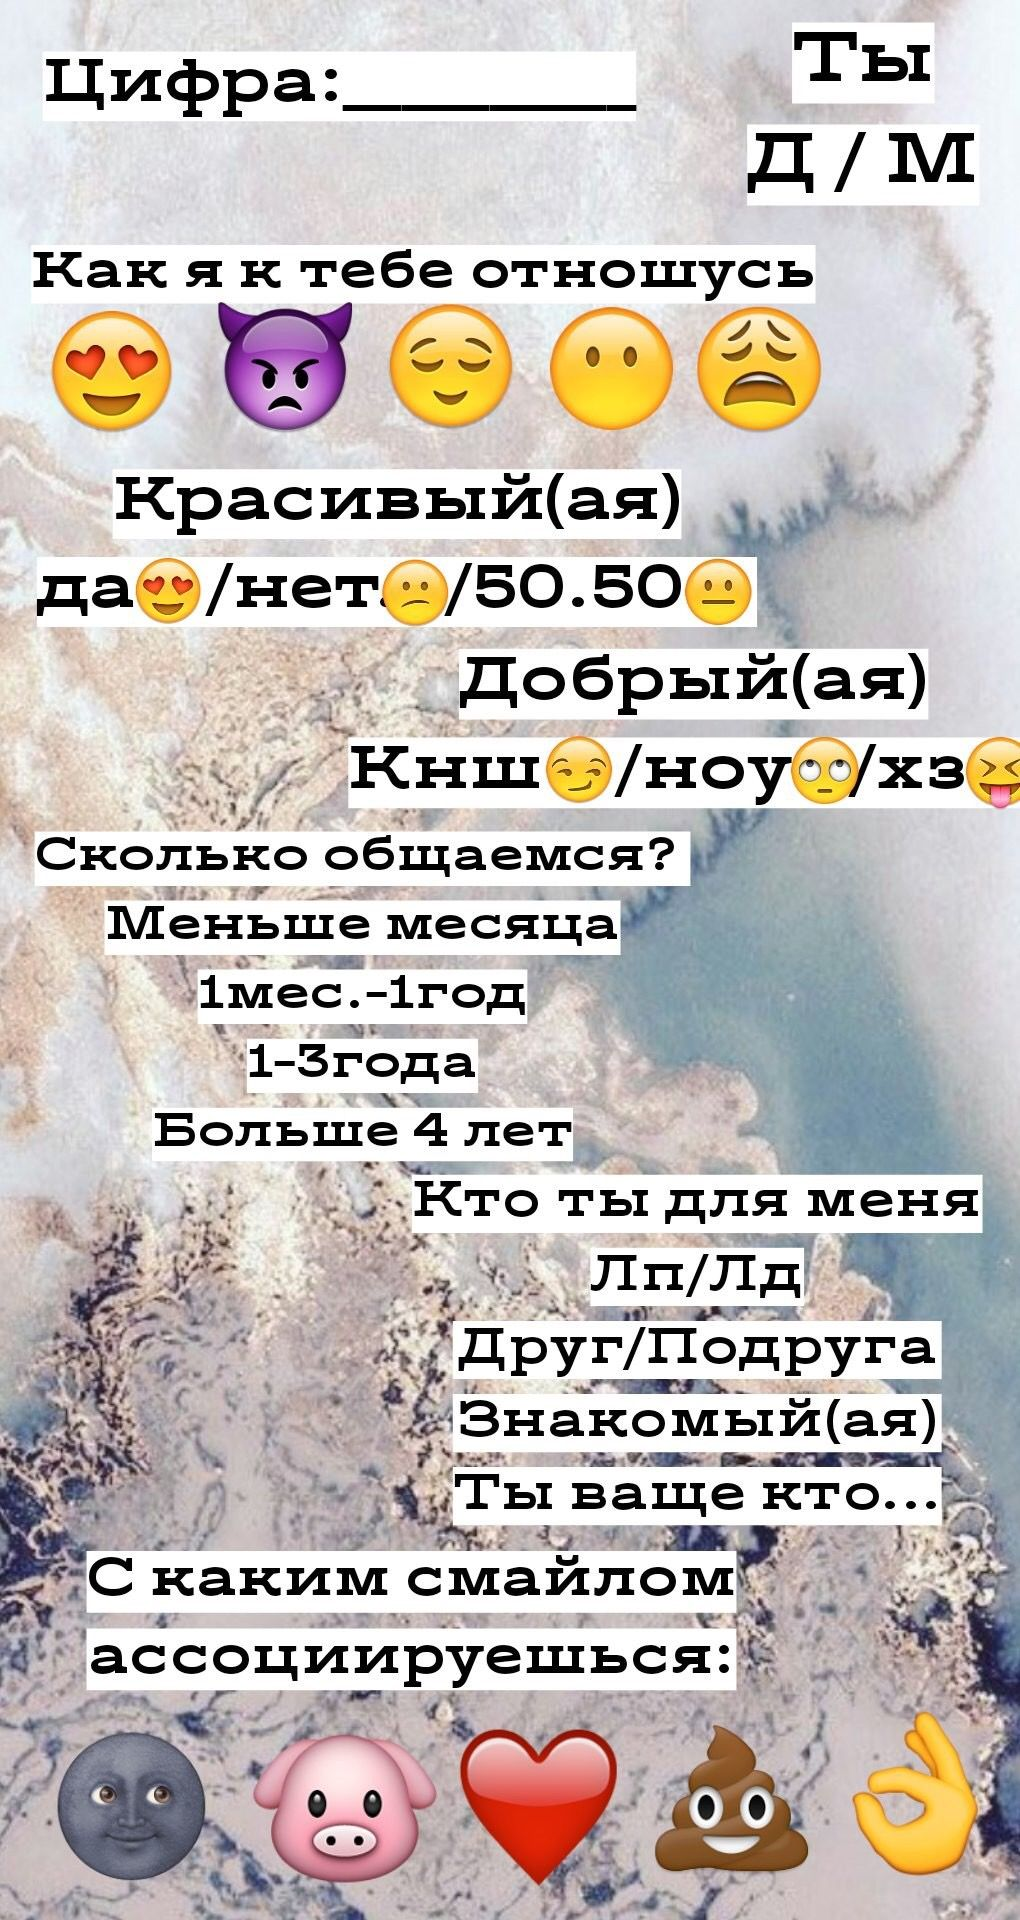 Pin By Sonya Sotnikova On Istoriya Instagram Aesthetic Iphone Wallpaper Iphone Wallpaper